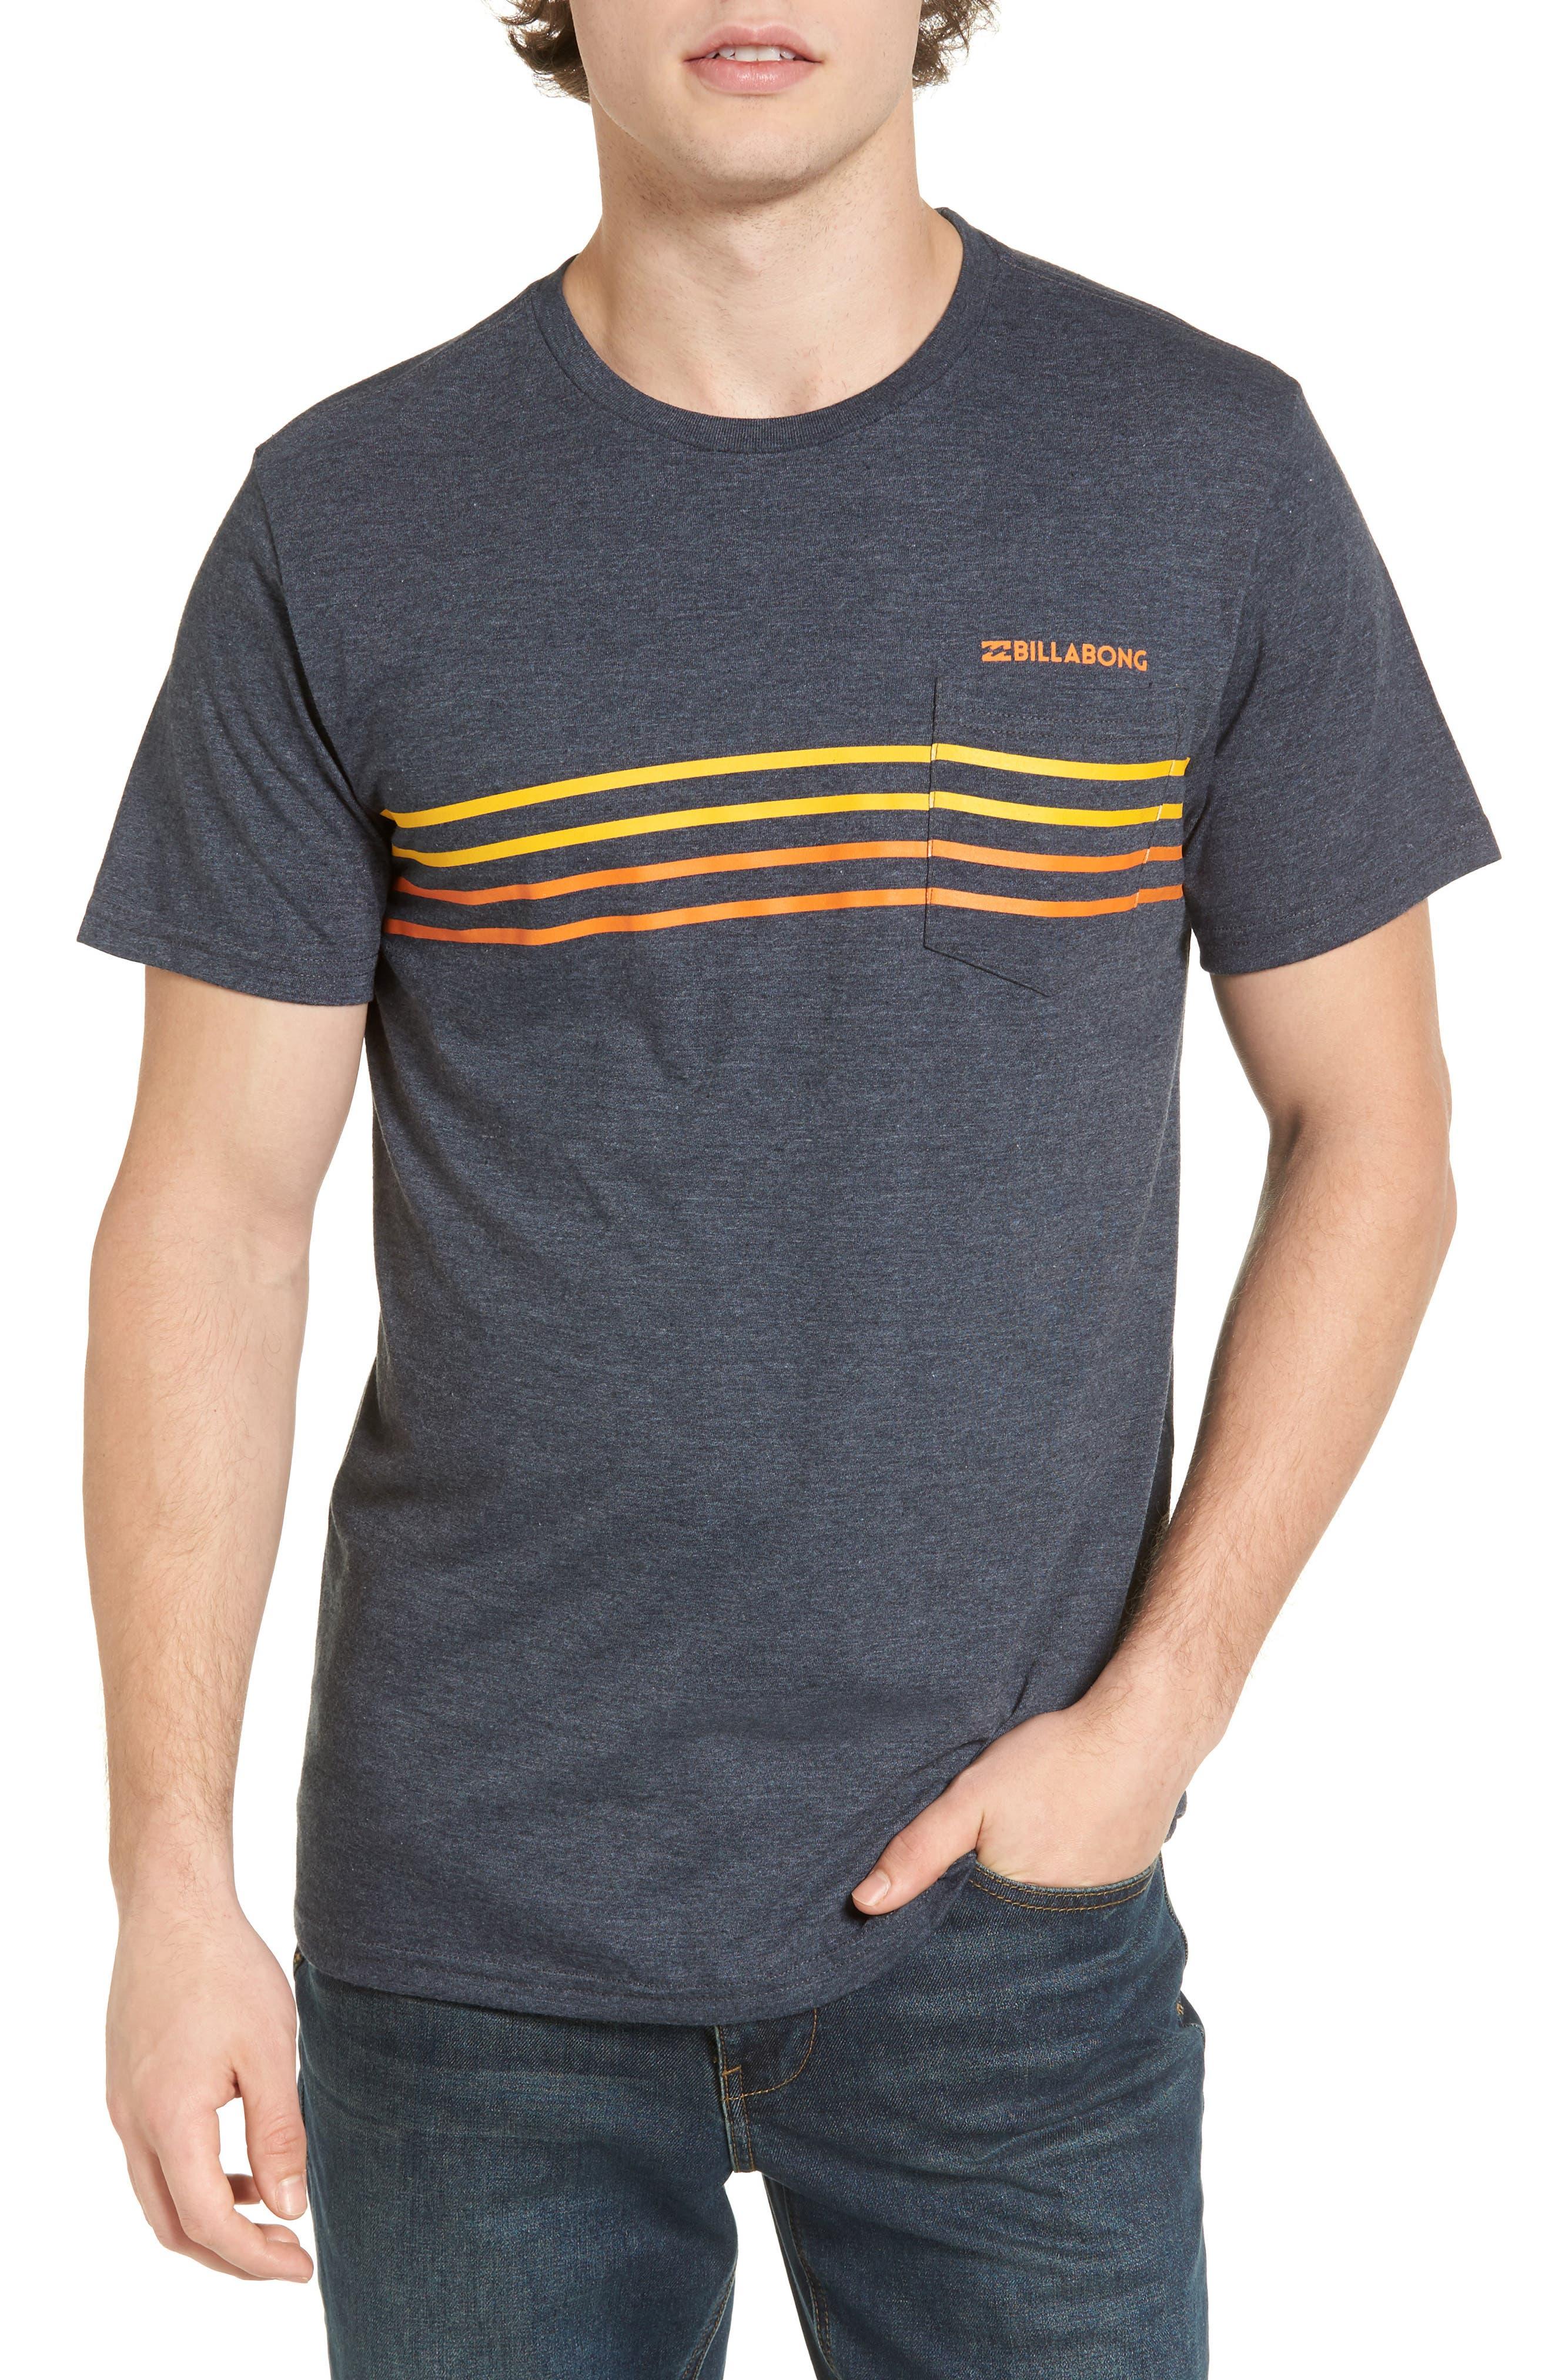 Billagong Spinner Graphic Pocket T-Shirt